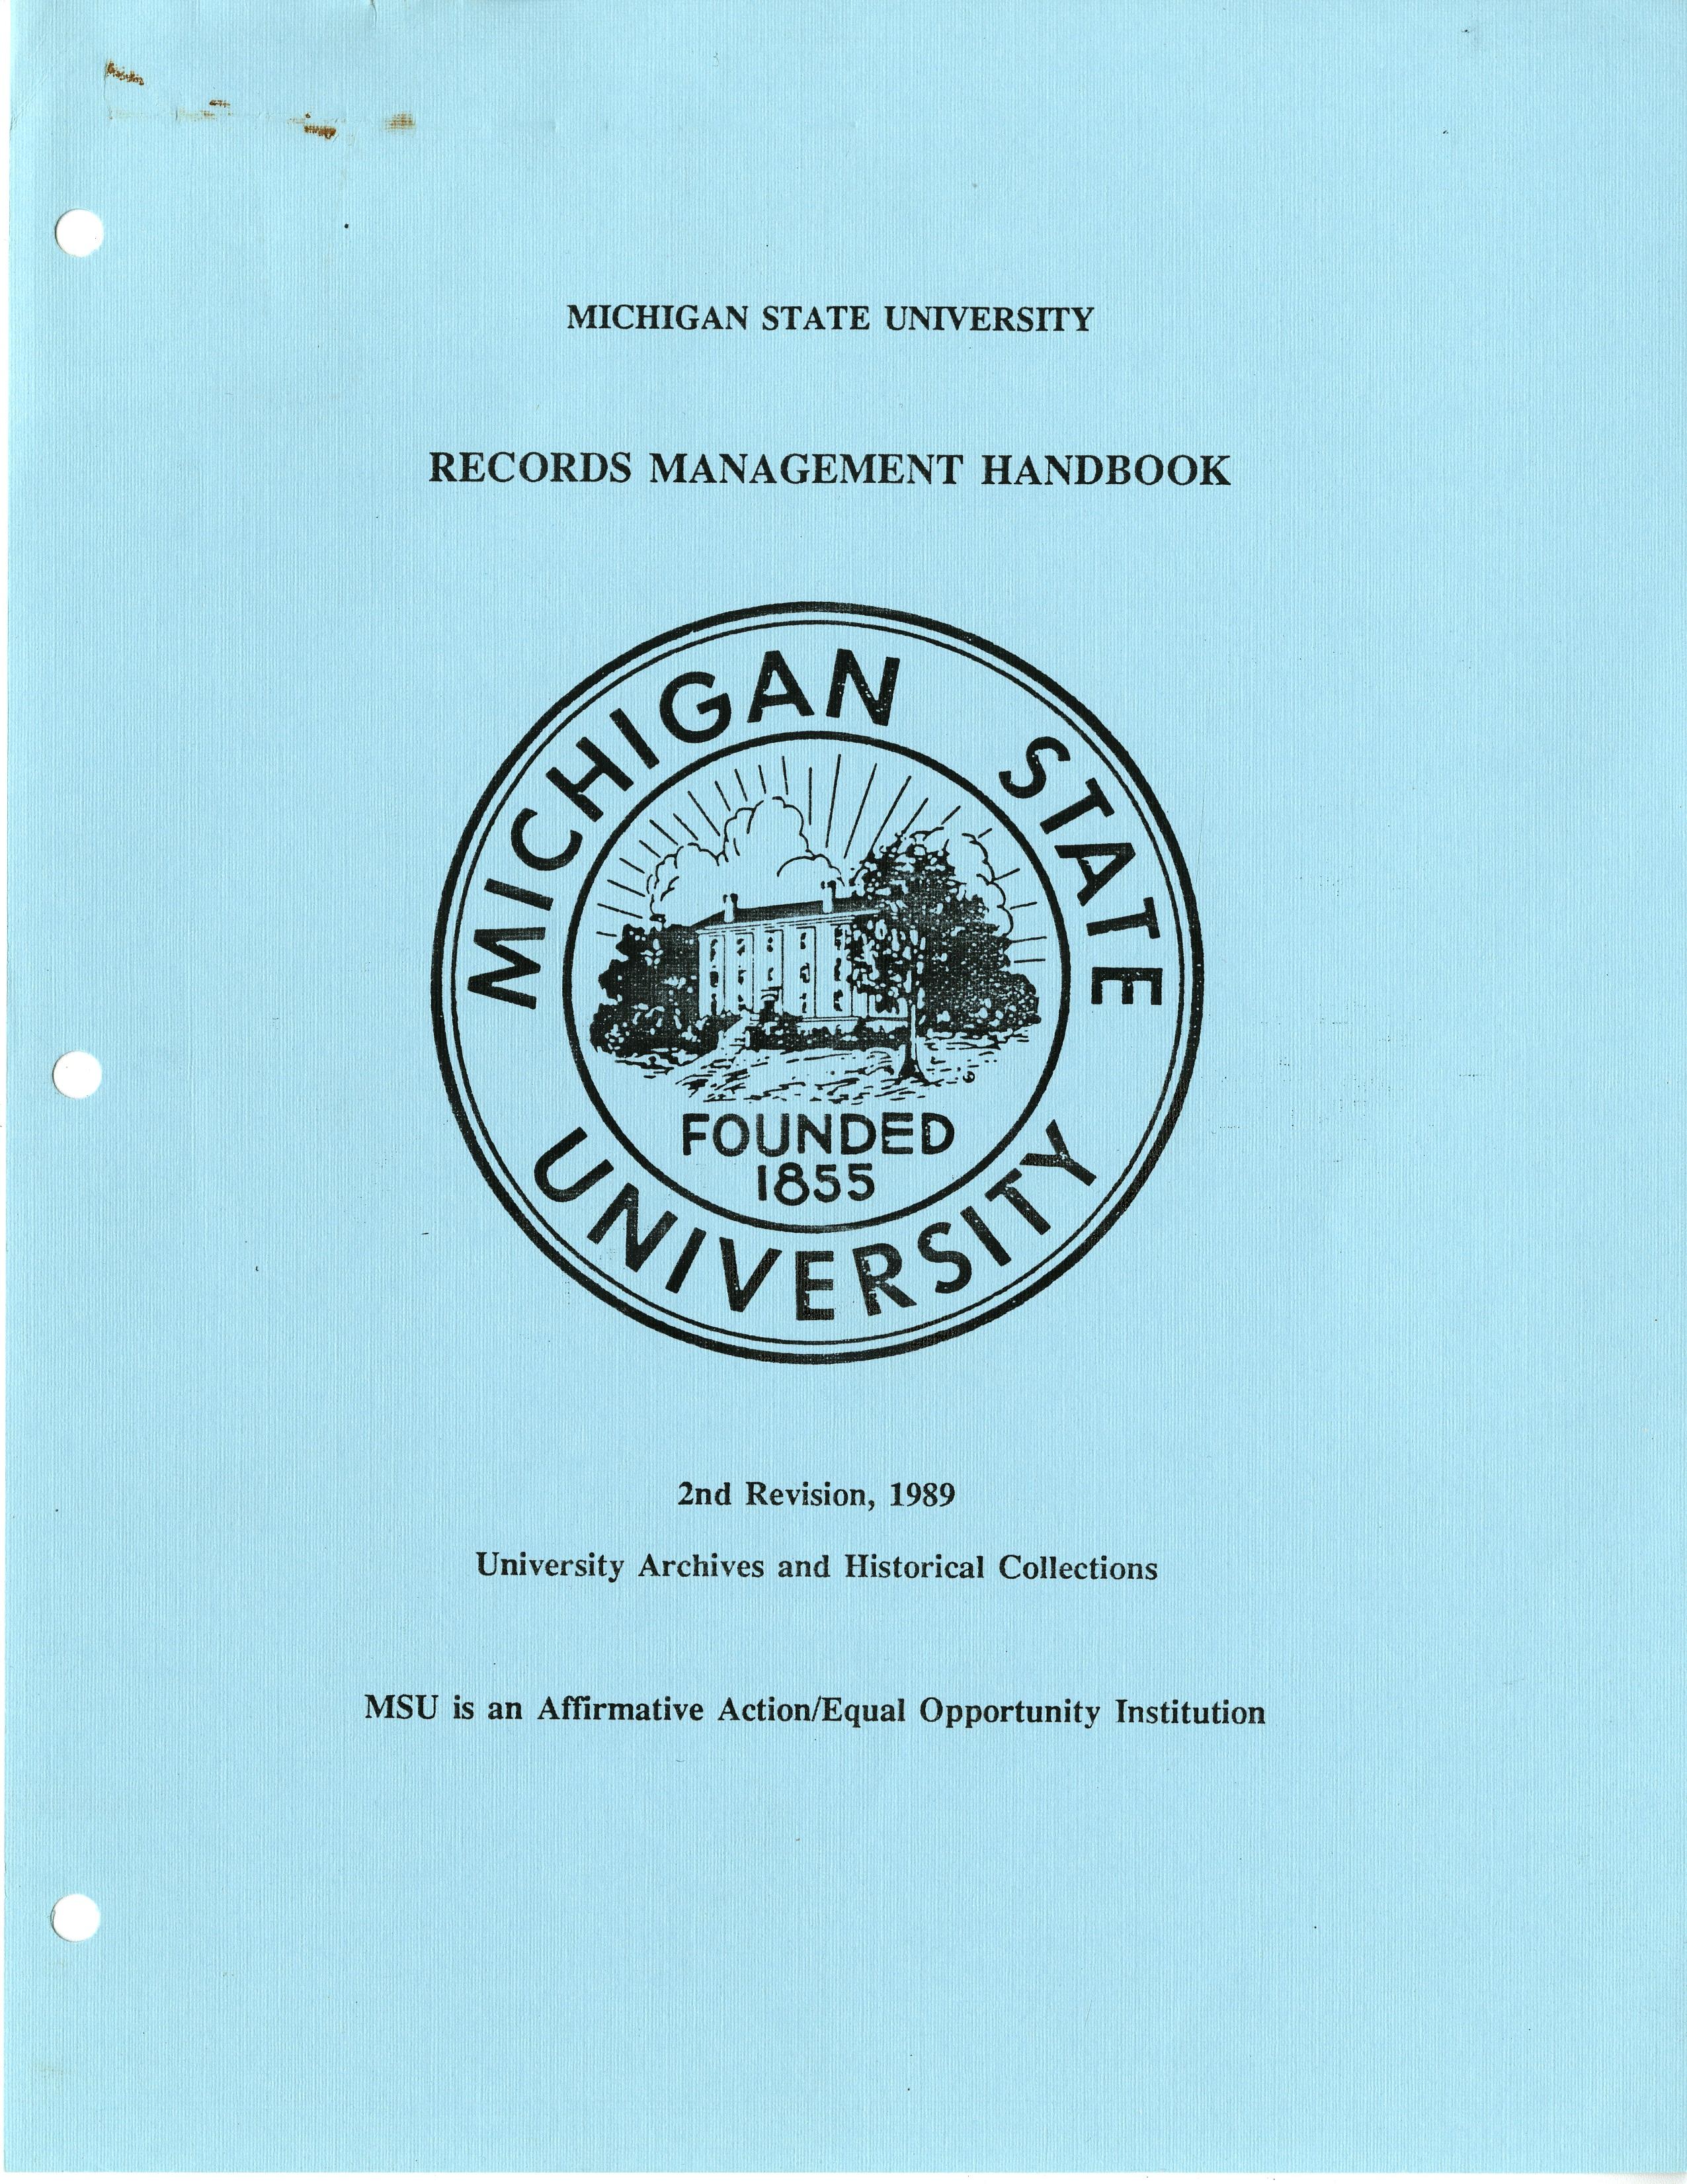 (Retired) Records Management Handbook, 1989